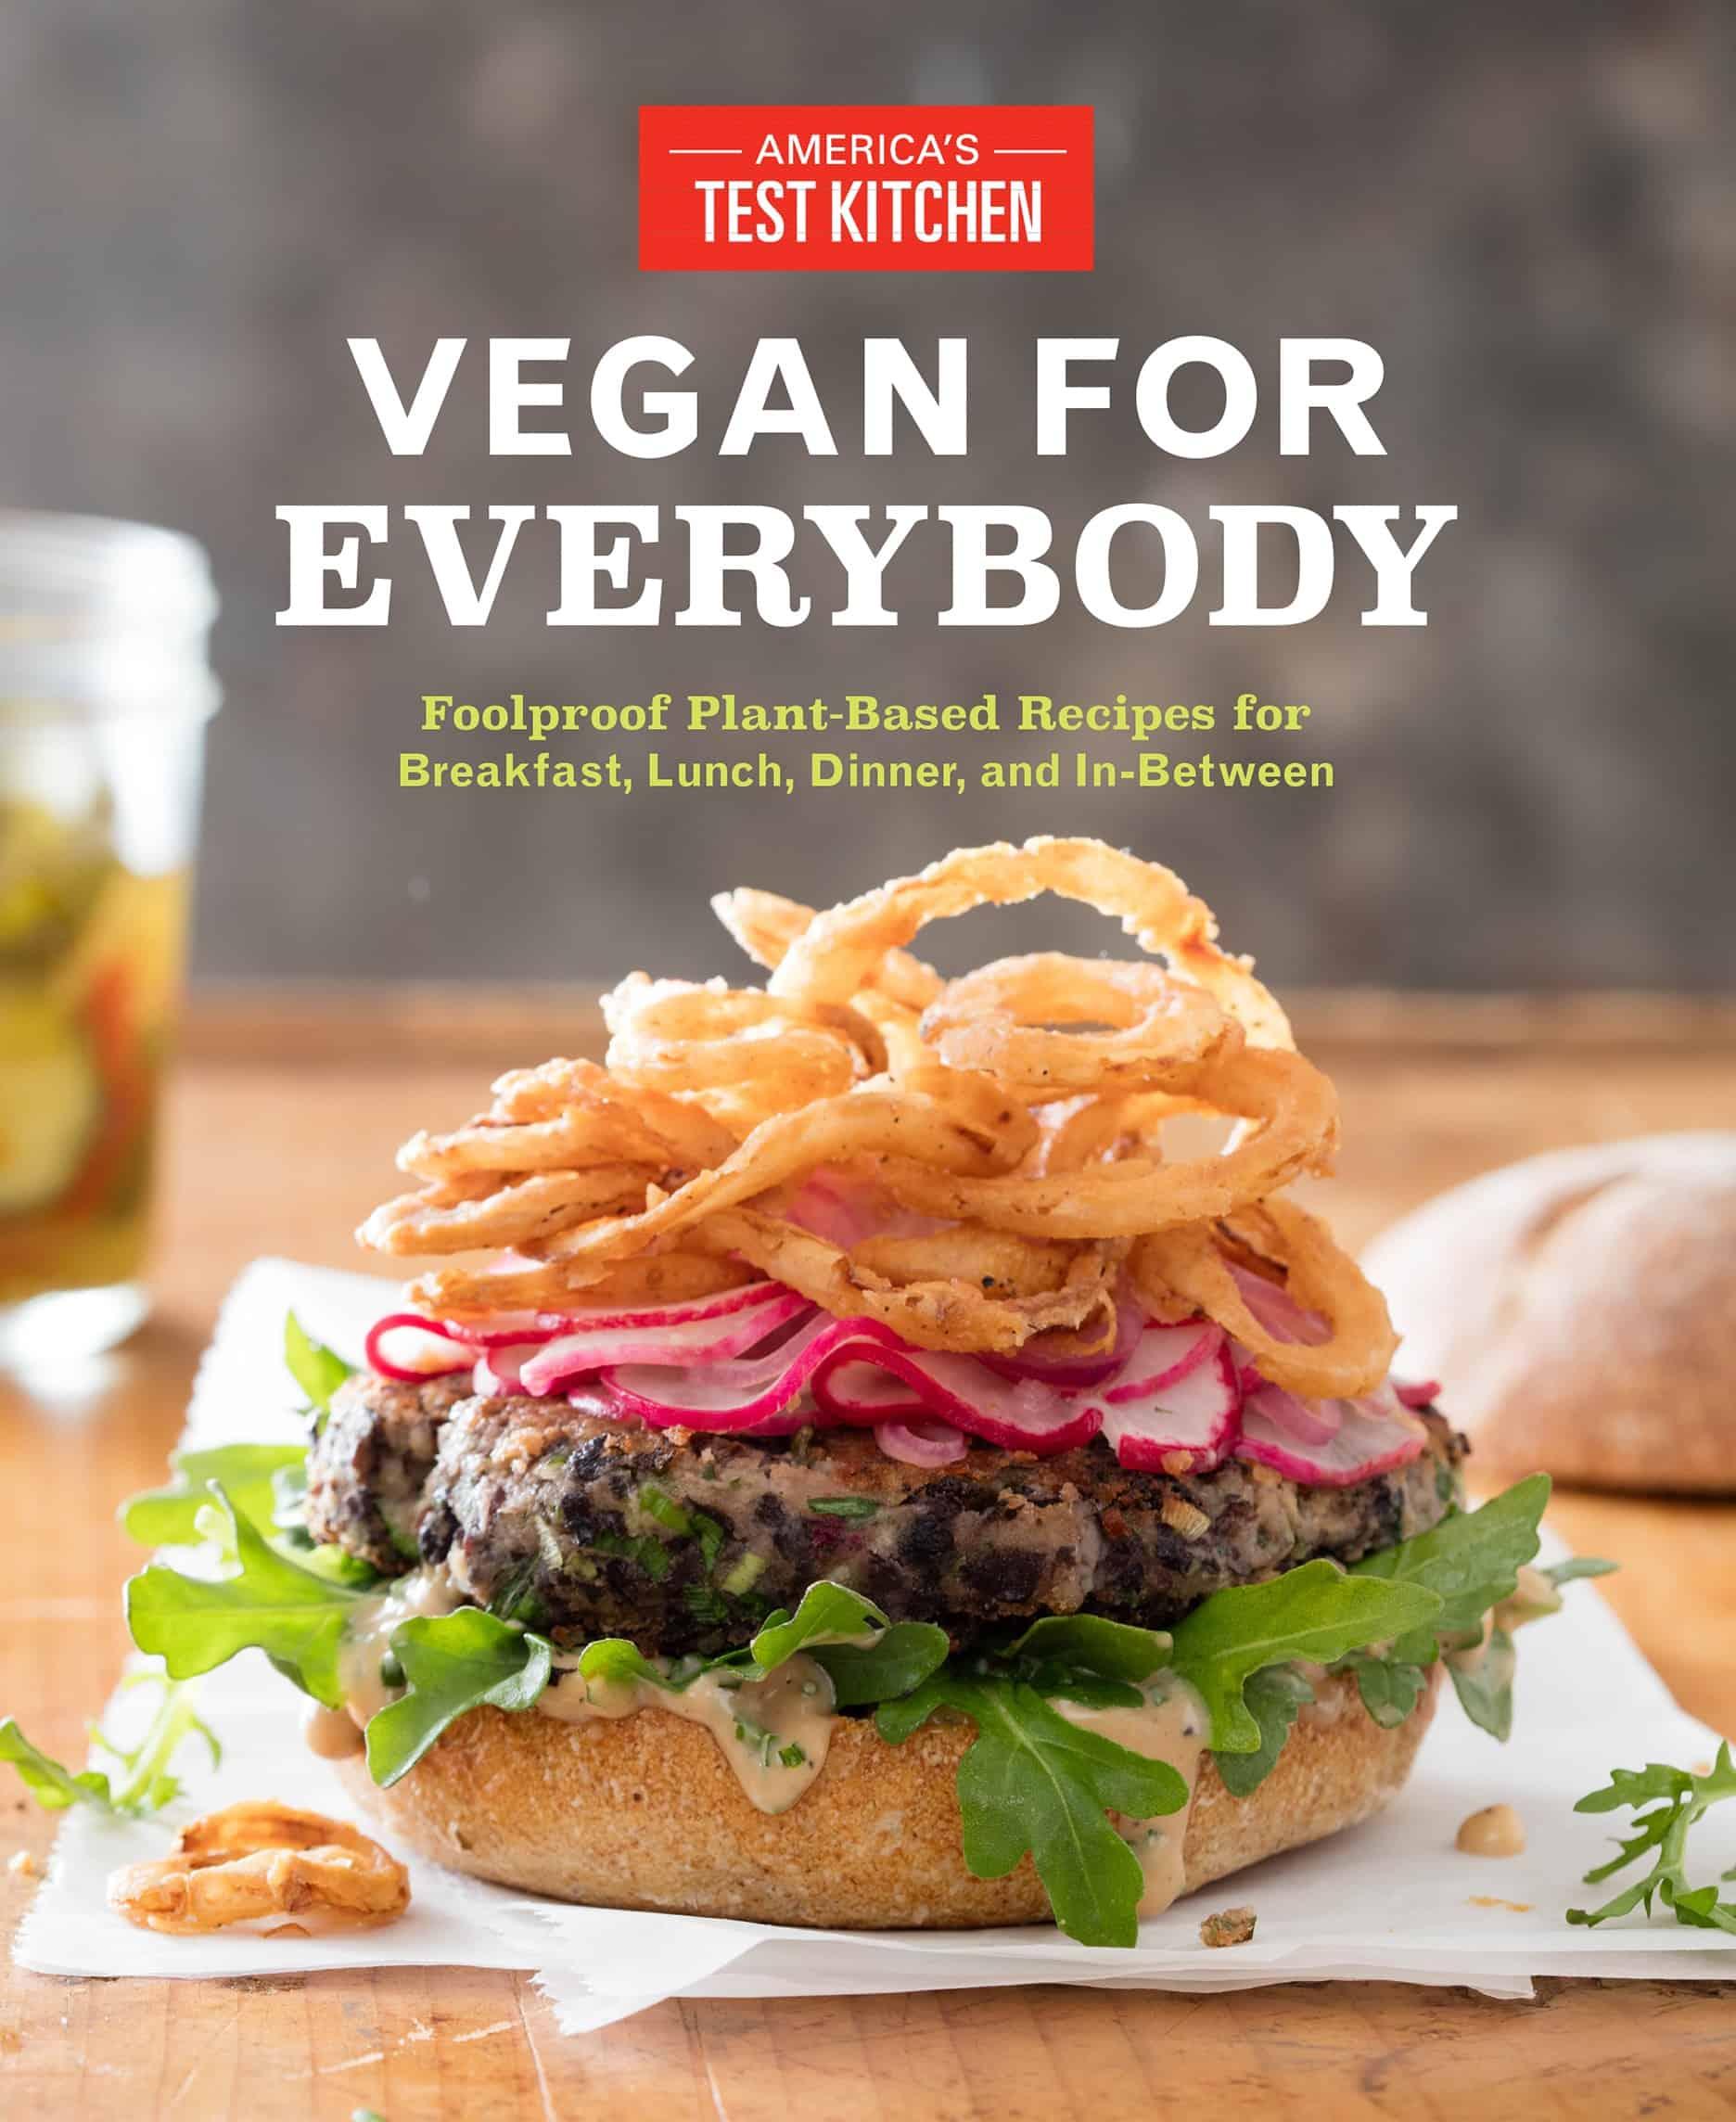 Garlicky Tofu Tabbouleh | Easy Fresh Lunch Idea | WorldofVegan.com | #tabbouleh #bulgur #salad #tofu #veganlunch #middleeasternvegan #mediterraneanvegan